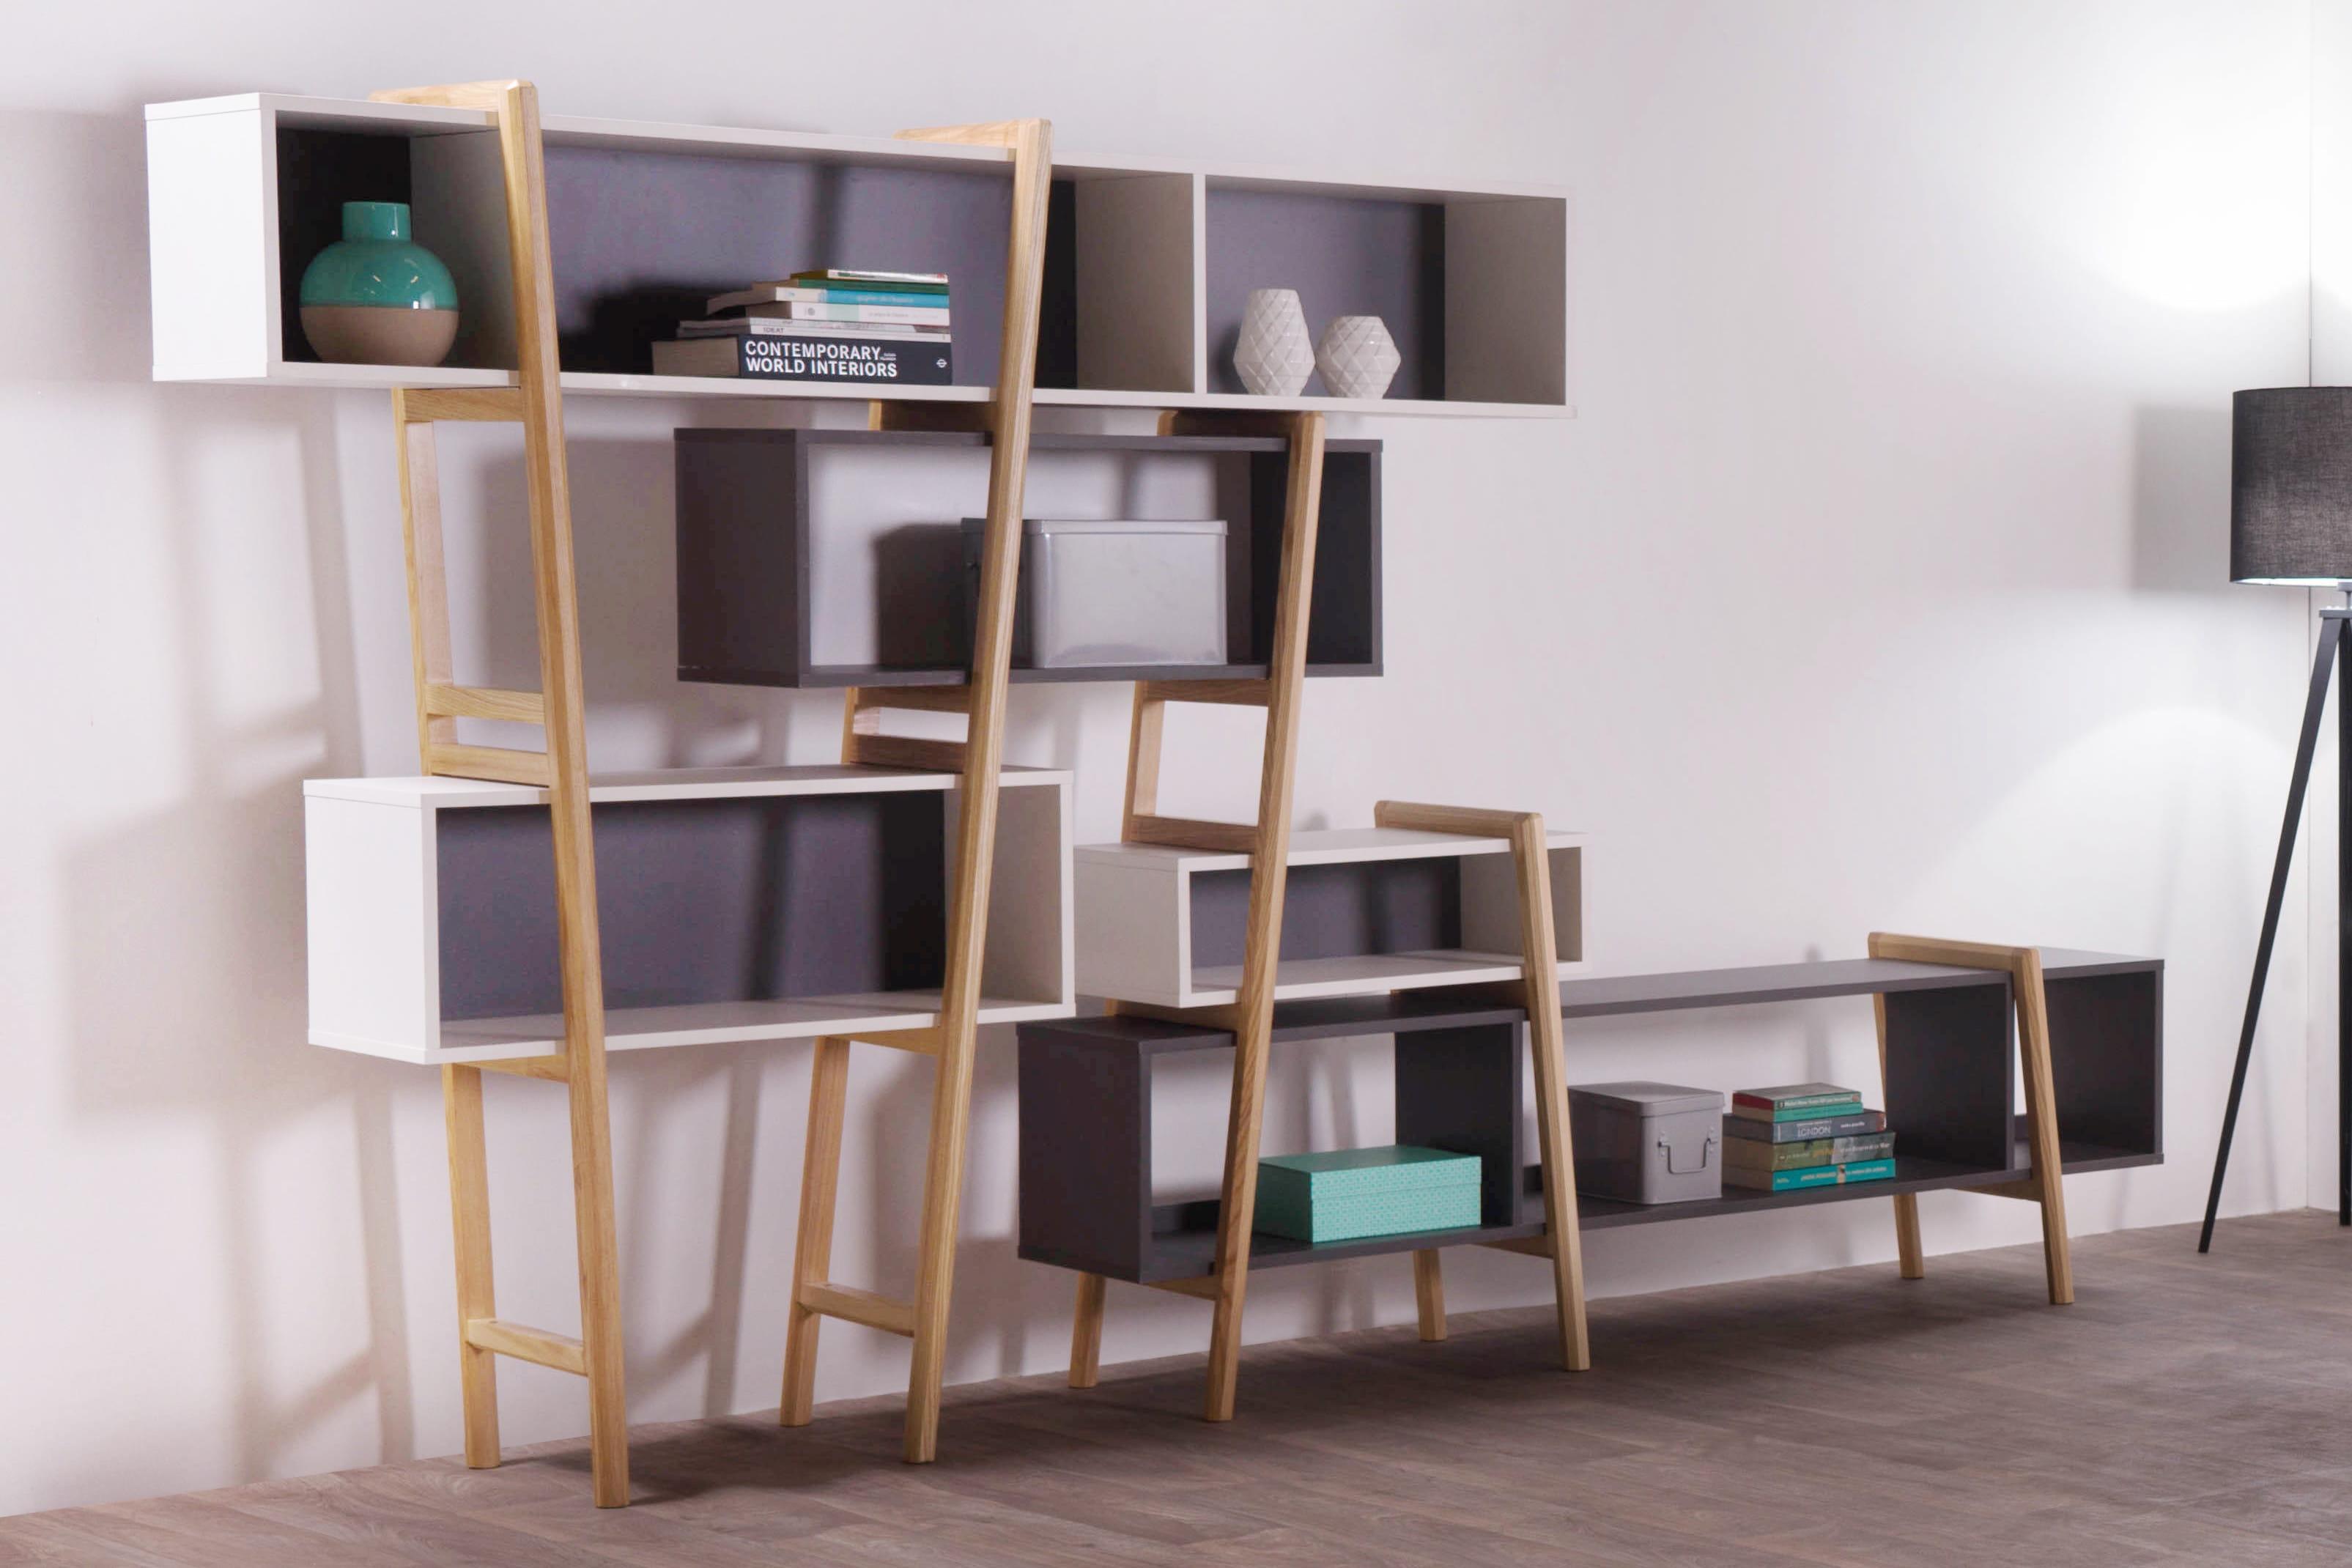 biblioth que design wood tang wood tang le mobilier. Black Bedroom Furniture Sets. Home Design Ideas